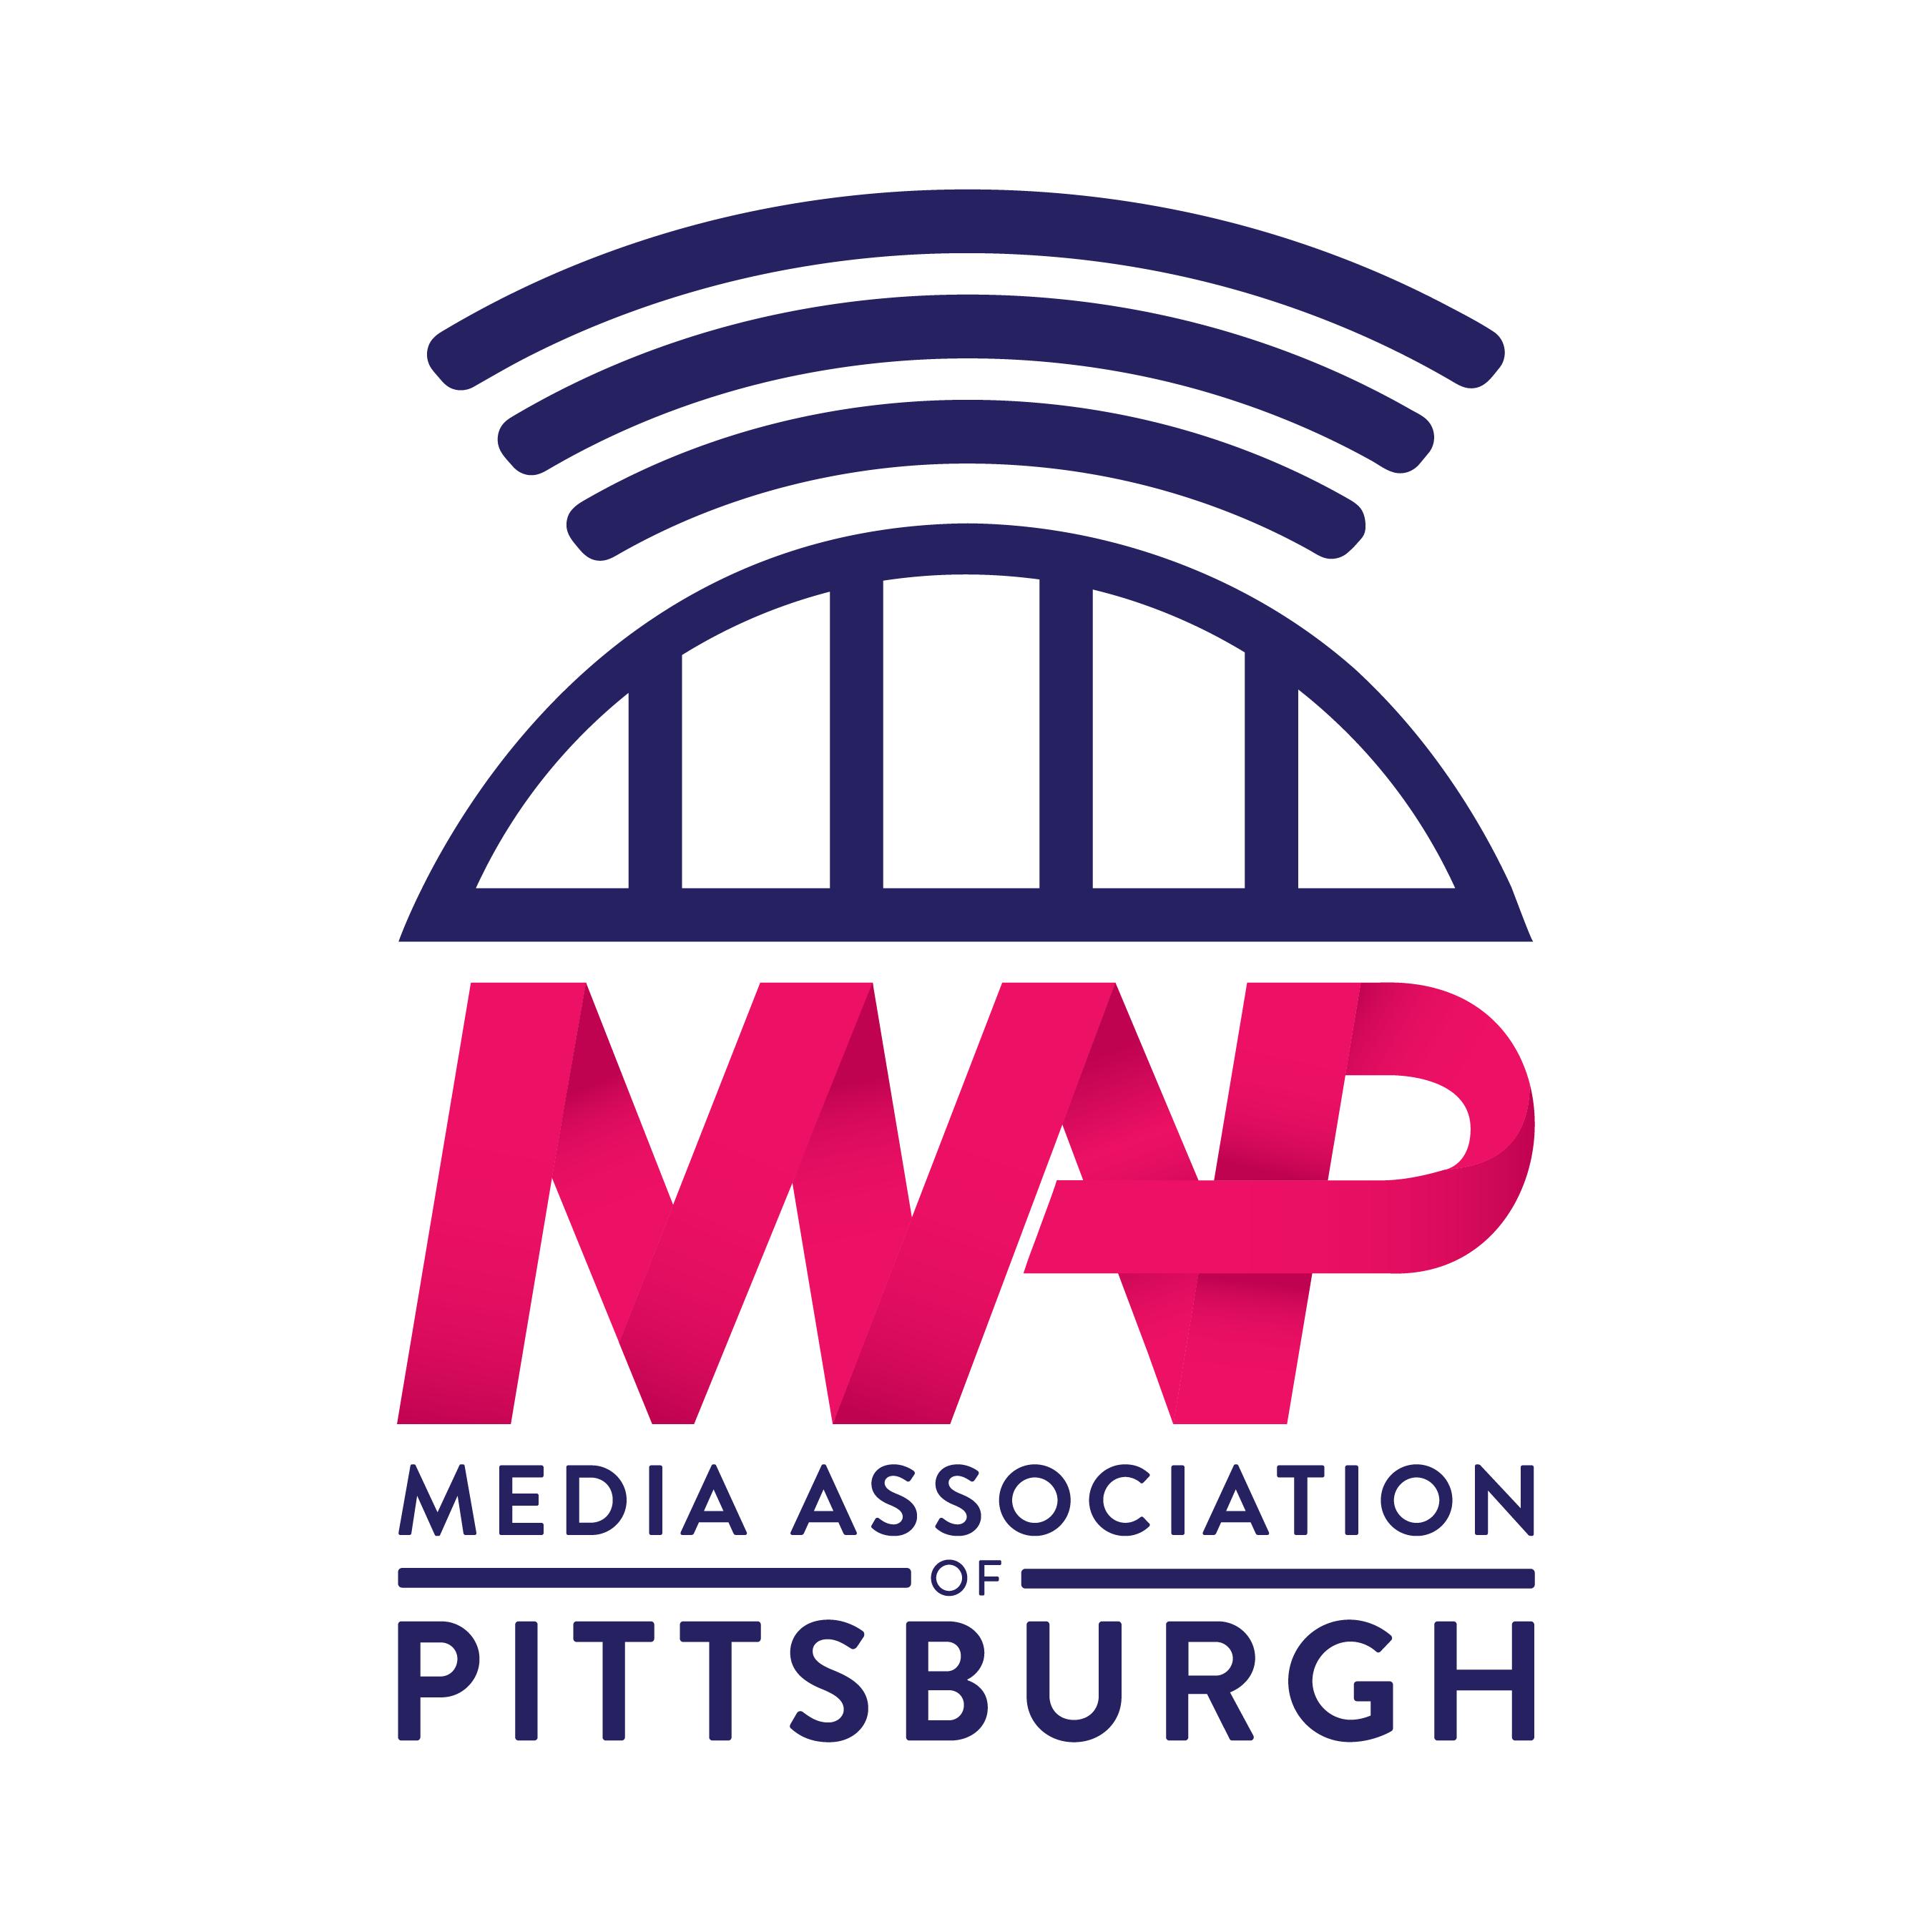 Media Association of Pittsburgh